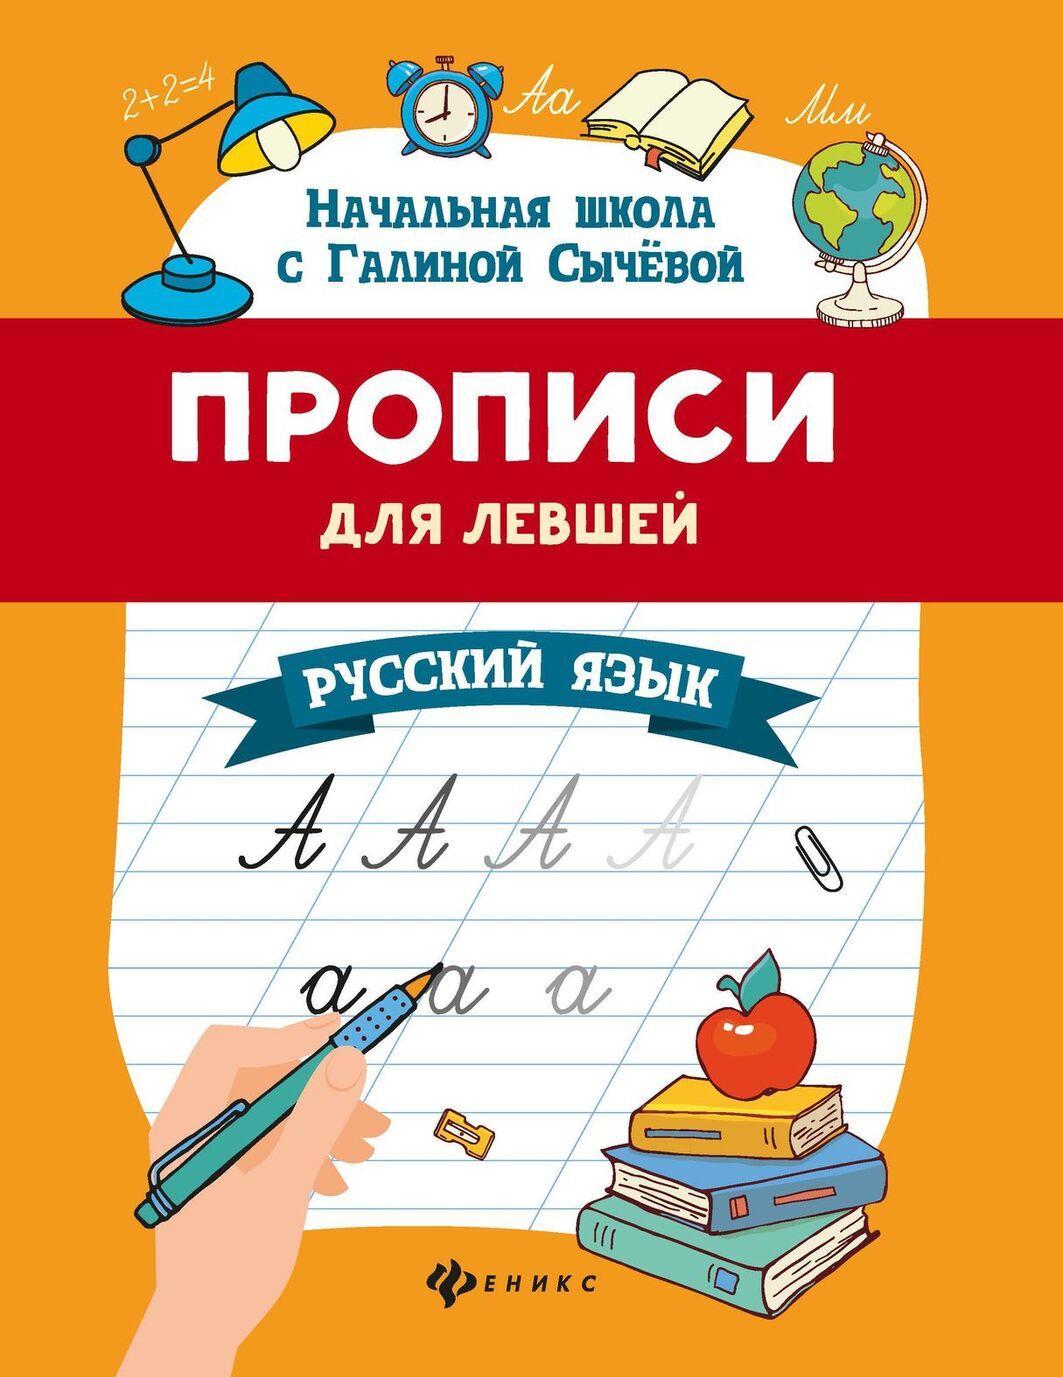 Propisi dlja levshej. Russkij jazyk